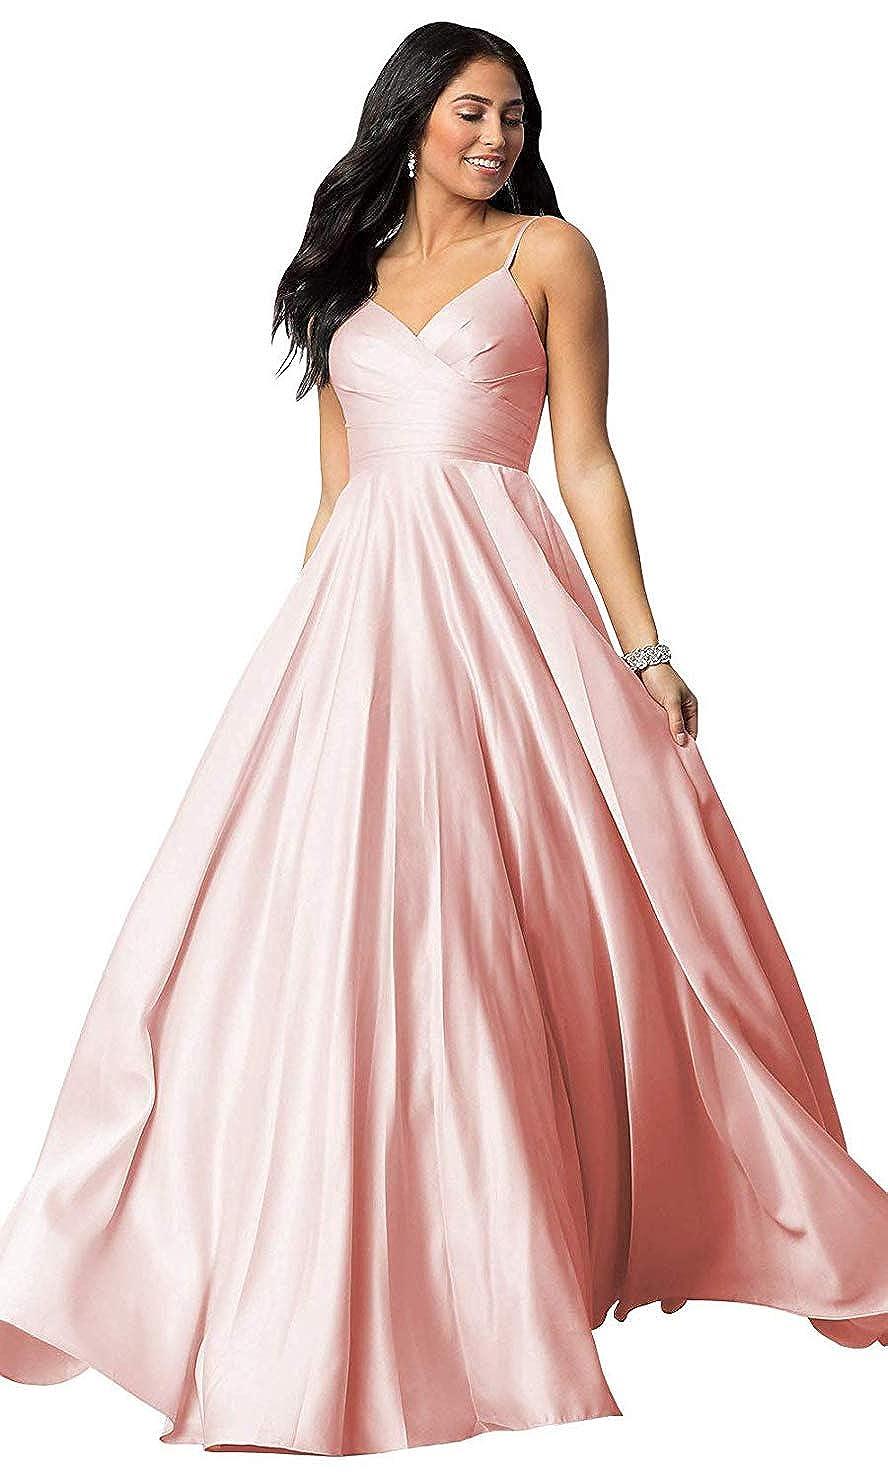 bluee FeiYueXinXing Satin VNeck Prom Dresses Long Spaghetti Strap Formal Prom Evening Gown